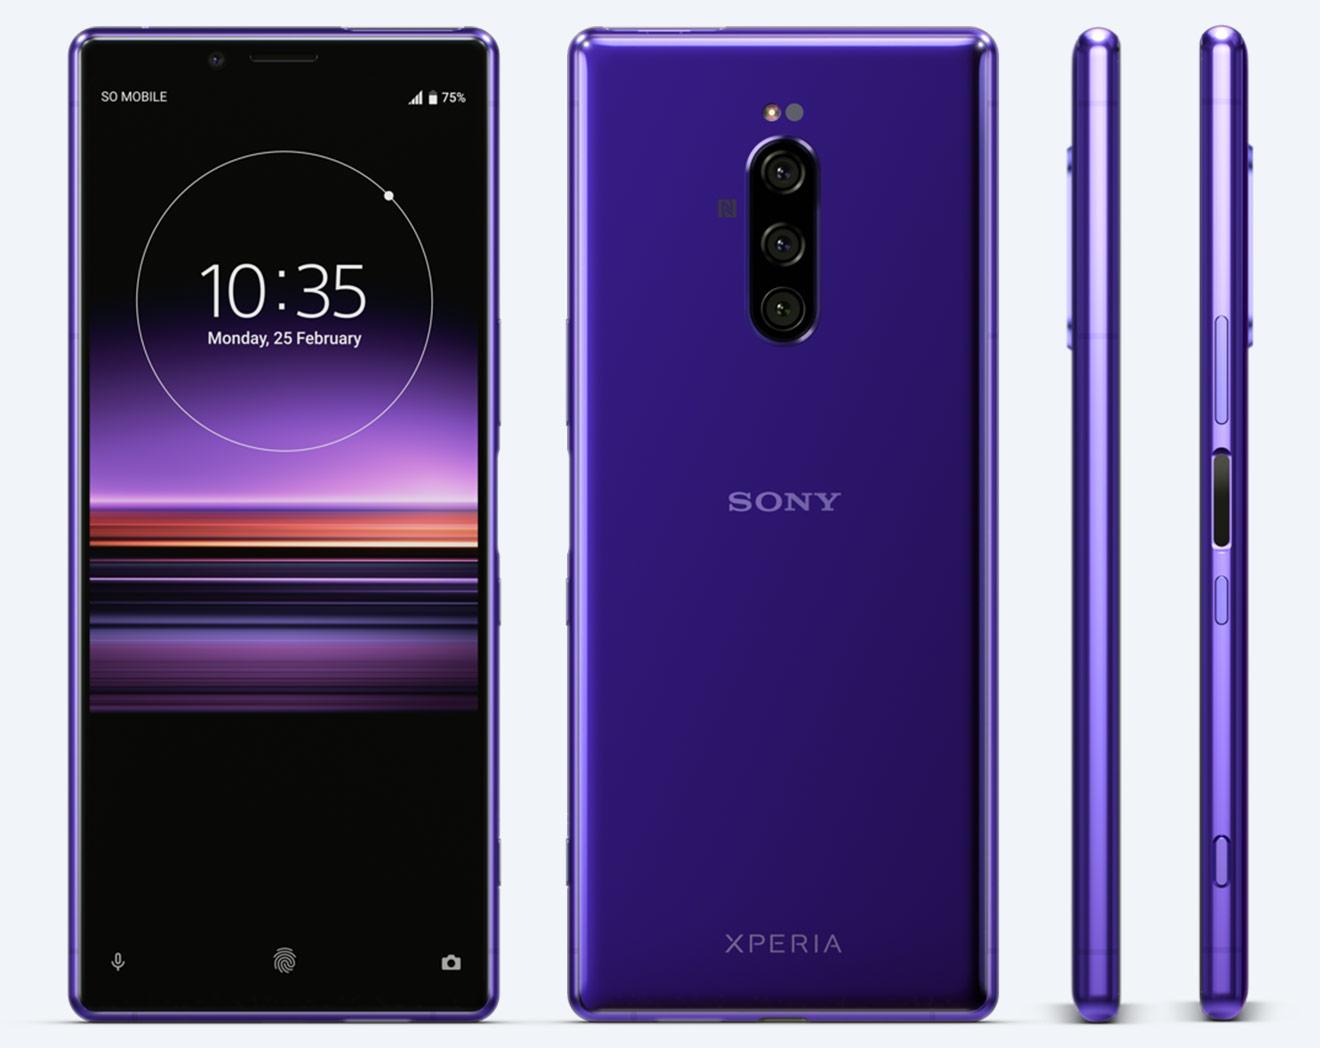 xperia-1-specifications-d6a2-colour-purple-87dd93571d0d9fb41aa24aae1cbd769d